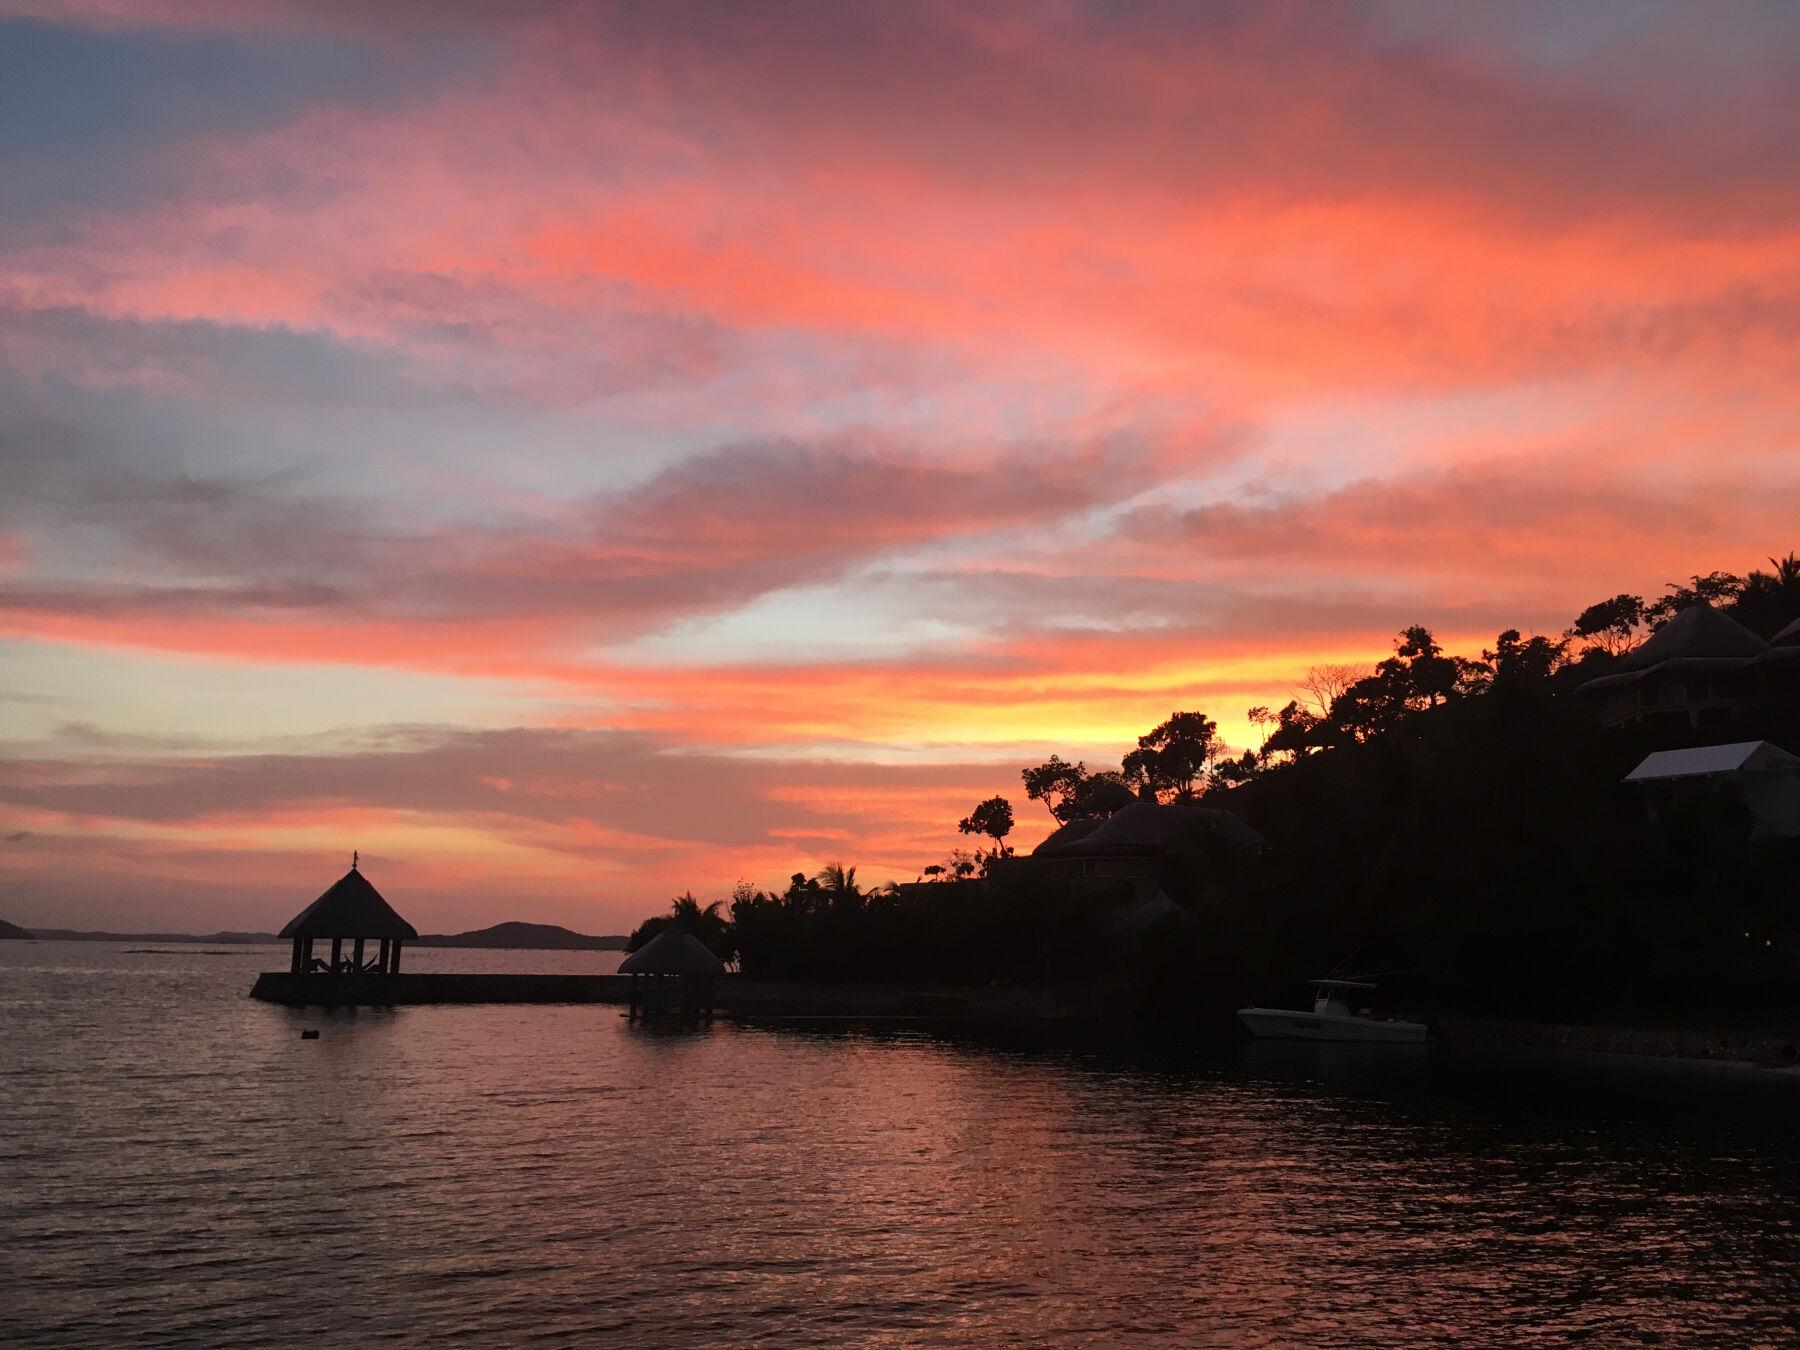 Sunset in Coron, Philippines